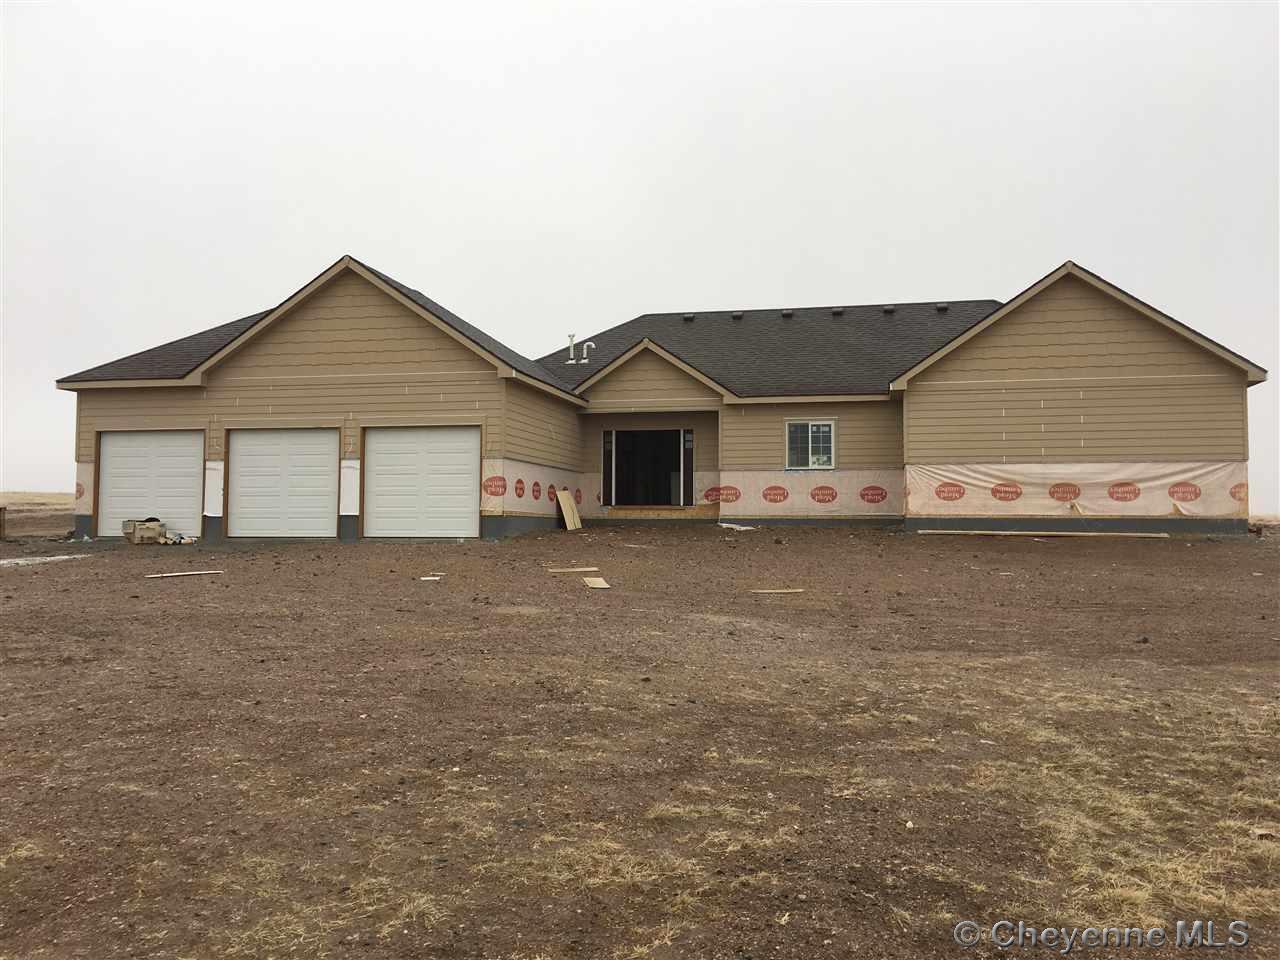 694 JAYMERS LN, Cheyenne, WY, 82009 Primary Photo